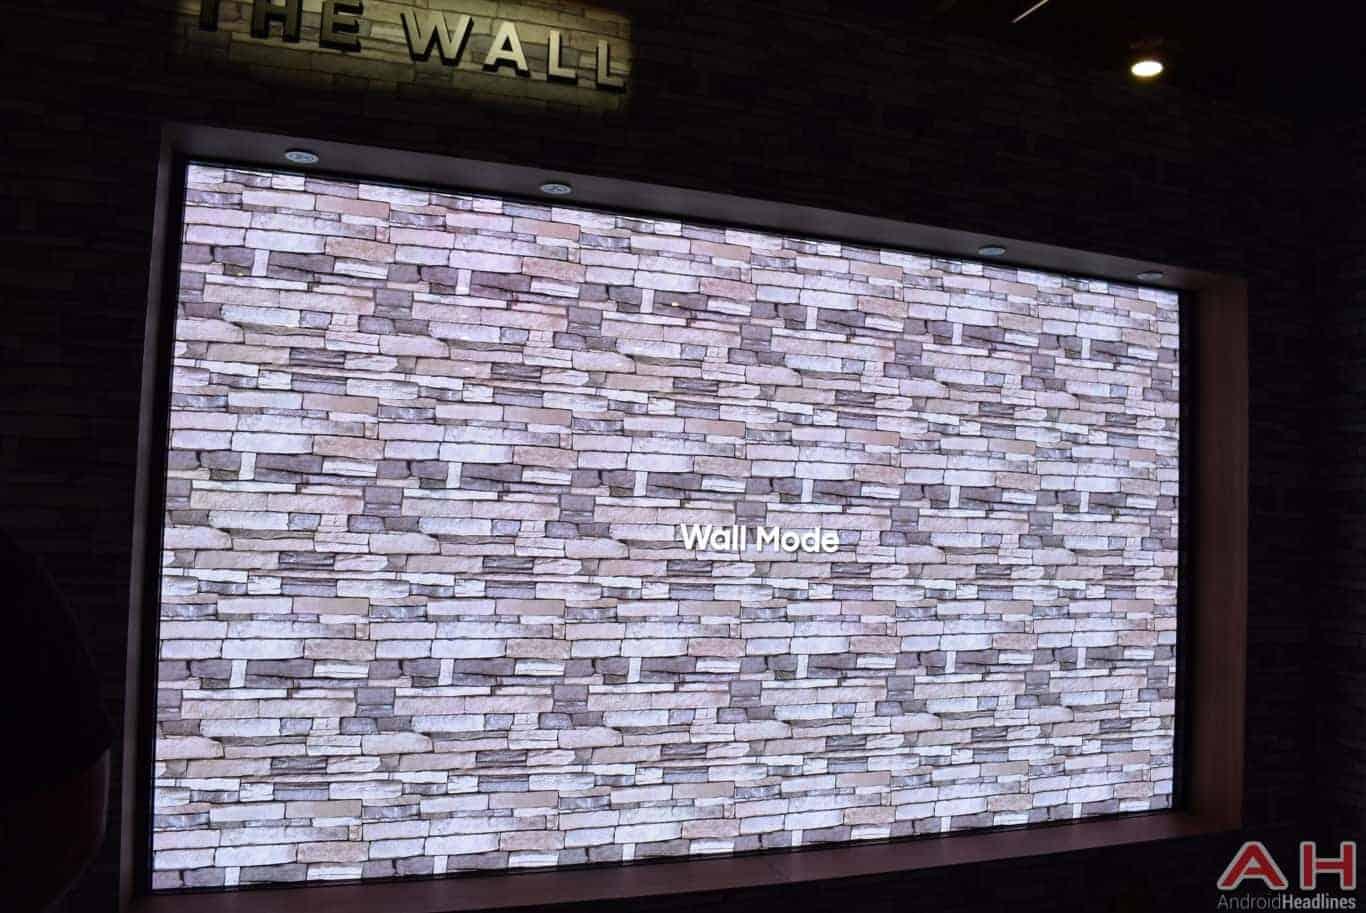 Samsung The Wall Modular MicroLED TV CES 2018 AH 13